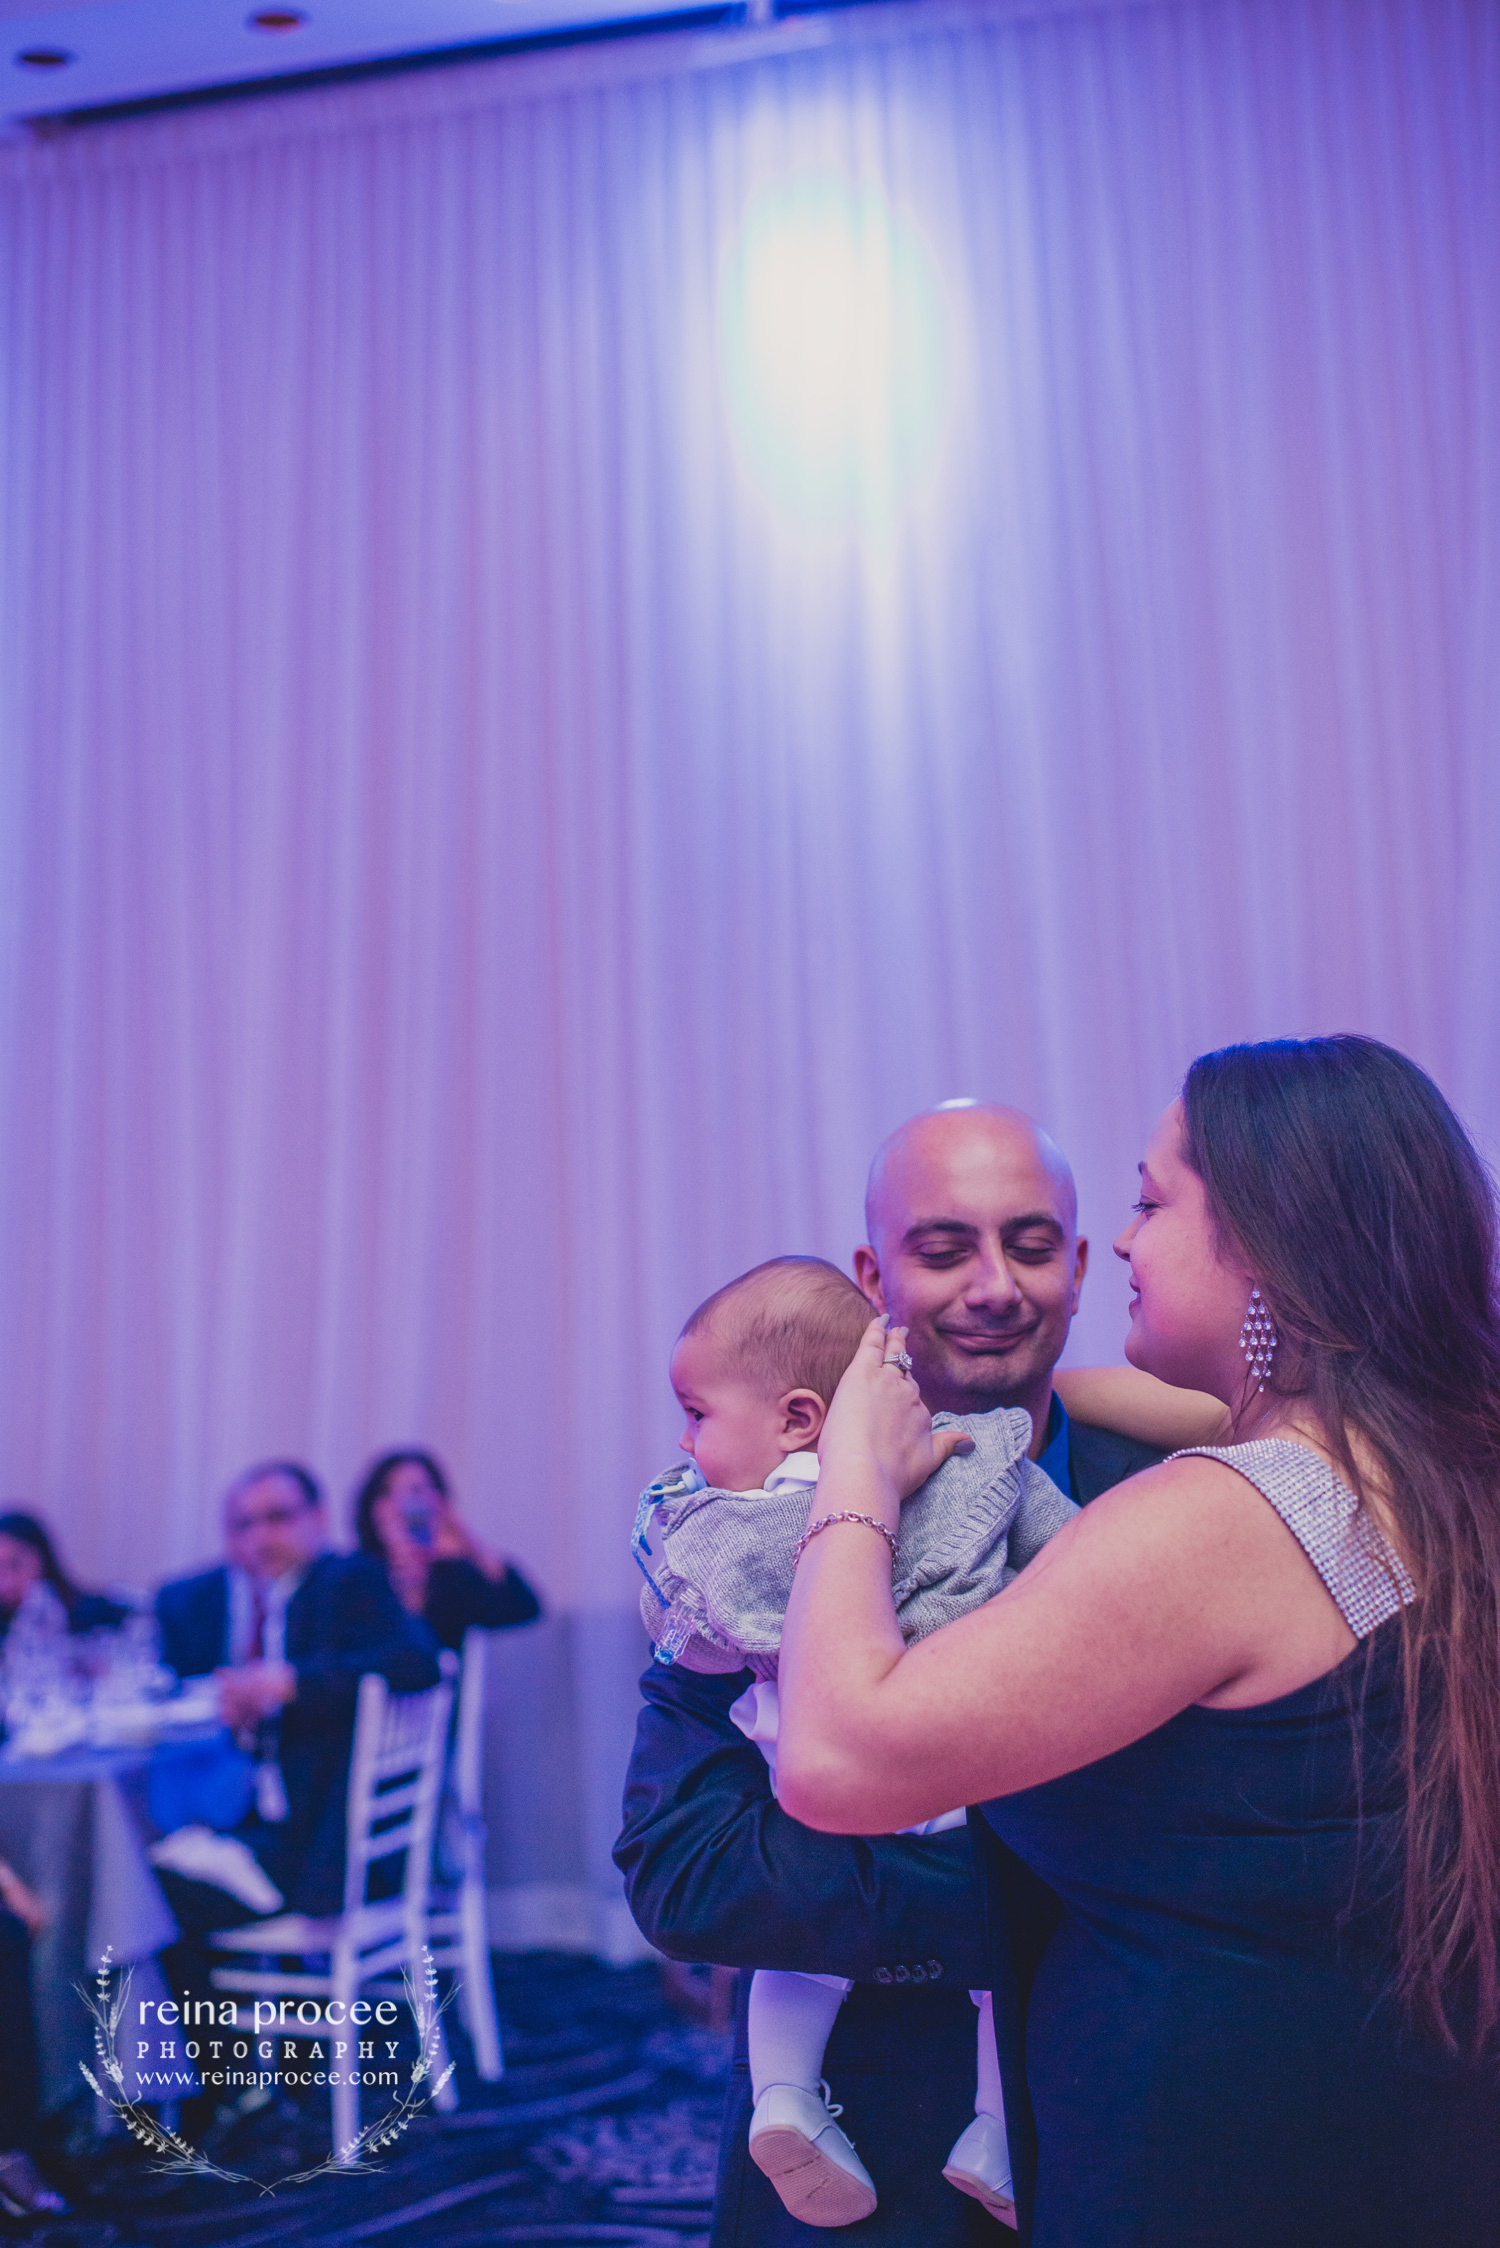 055-baptism-photographer-montreal-family-best-photos-portraits.jpg